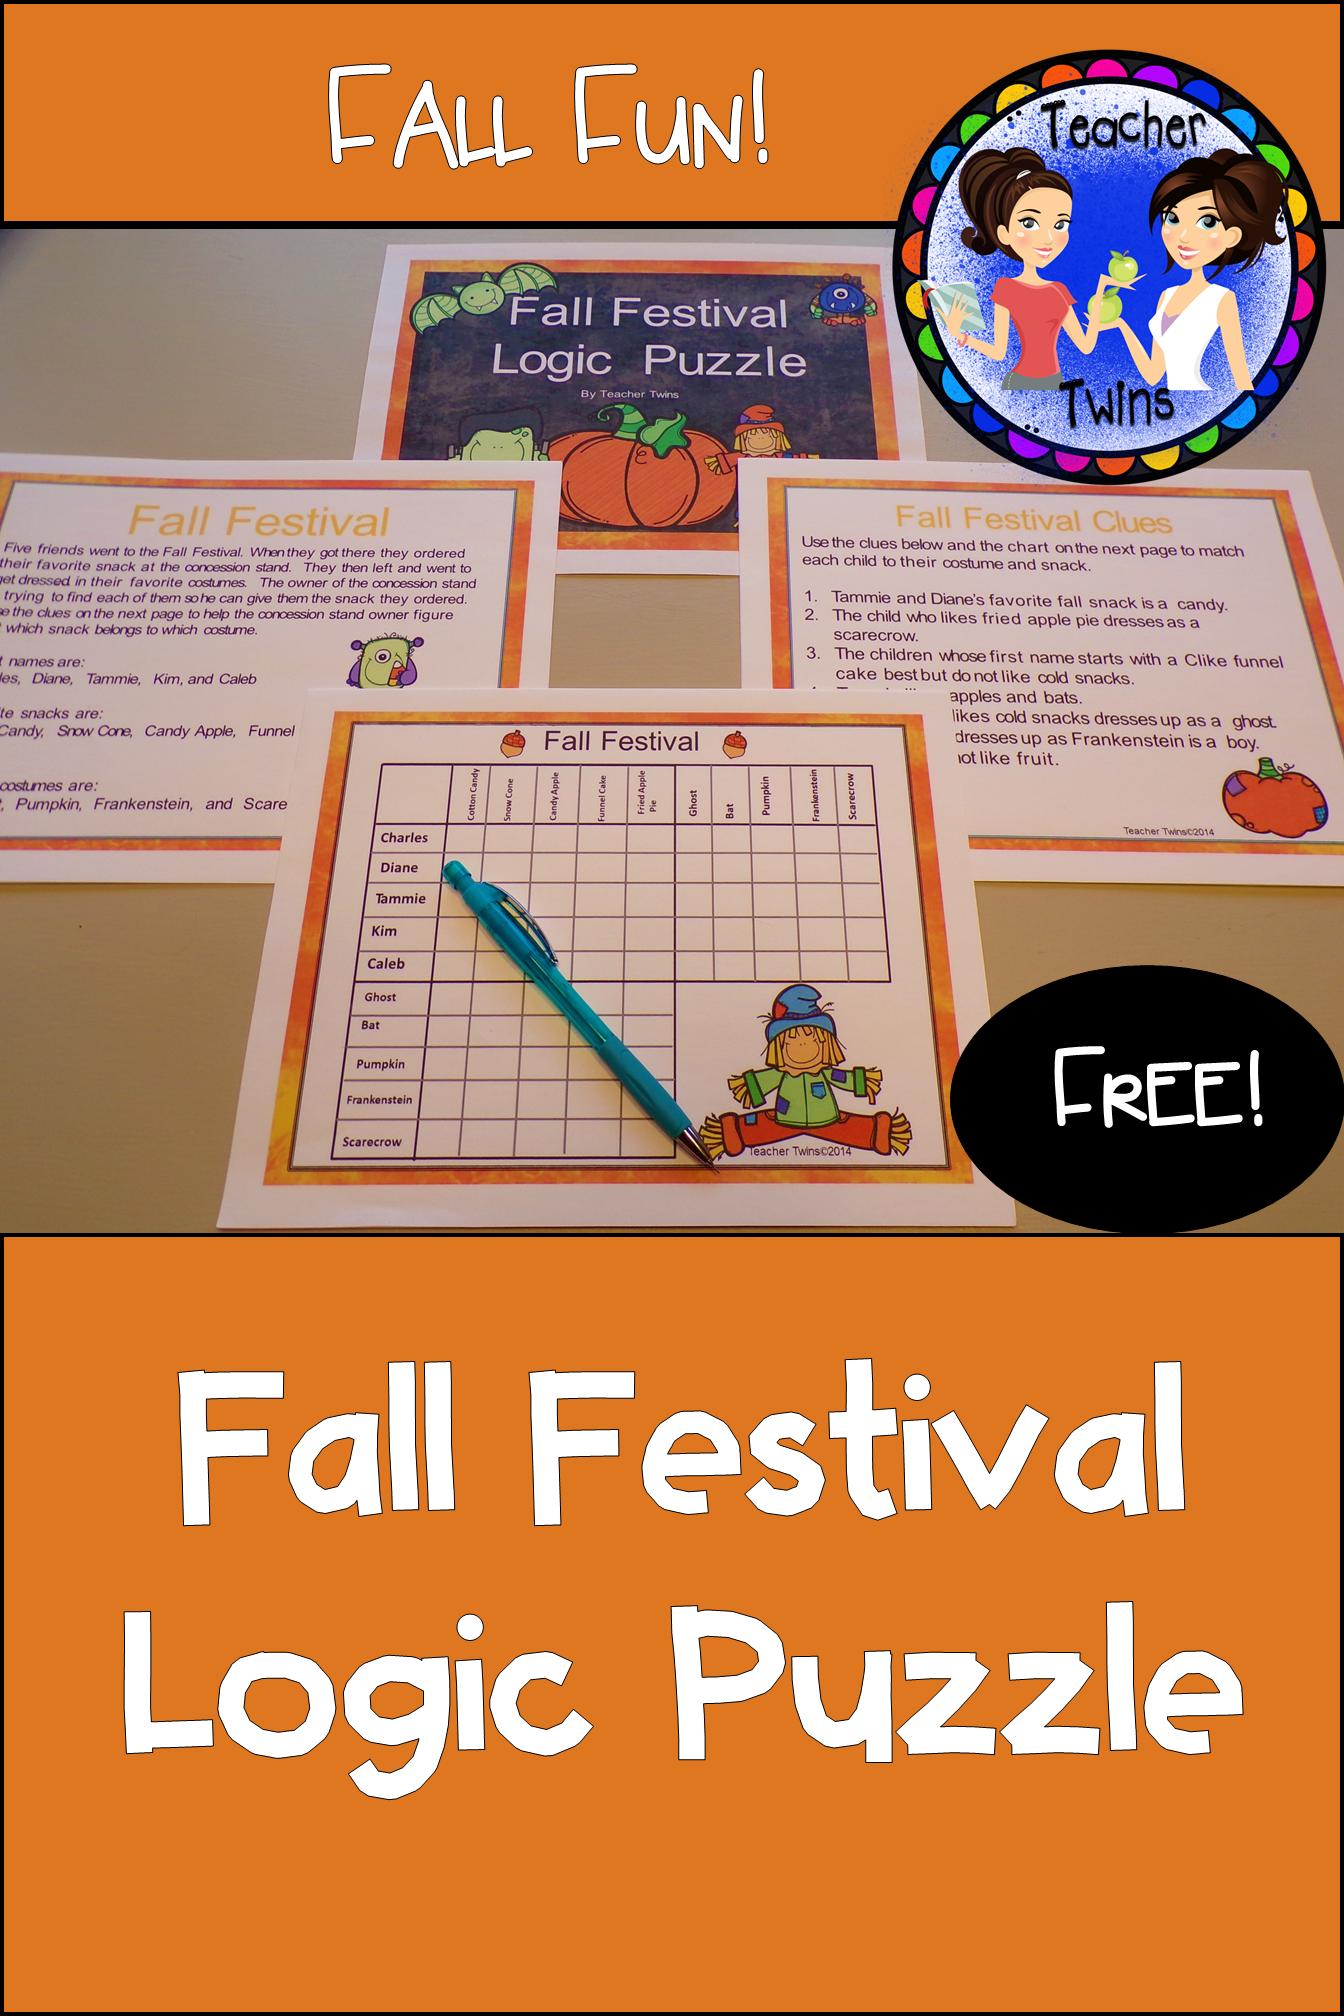 Fall Festival Logic Puzzle Problem Solving Activities Maths Activities Middle School Algebra Activities [ 2016 x 1344 Pixel ]